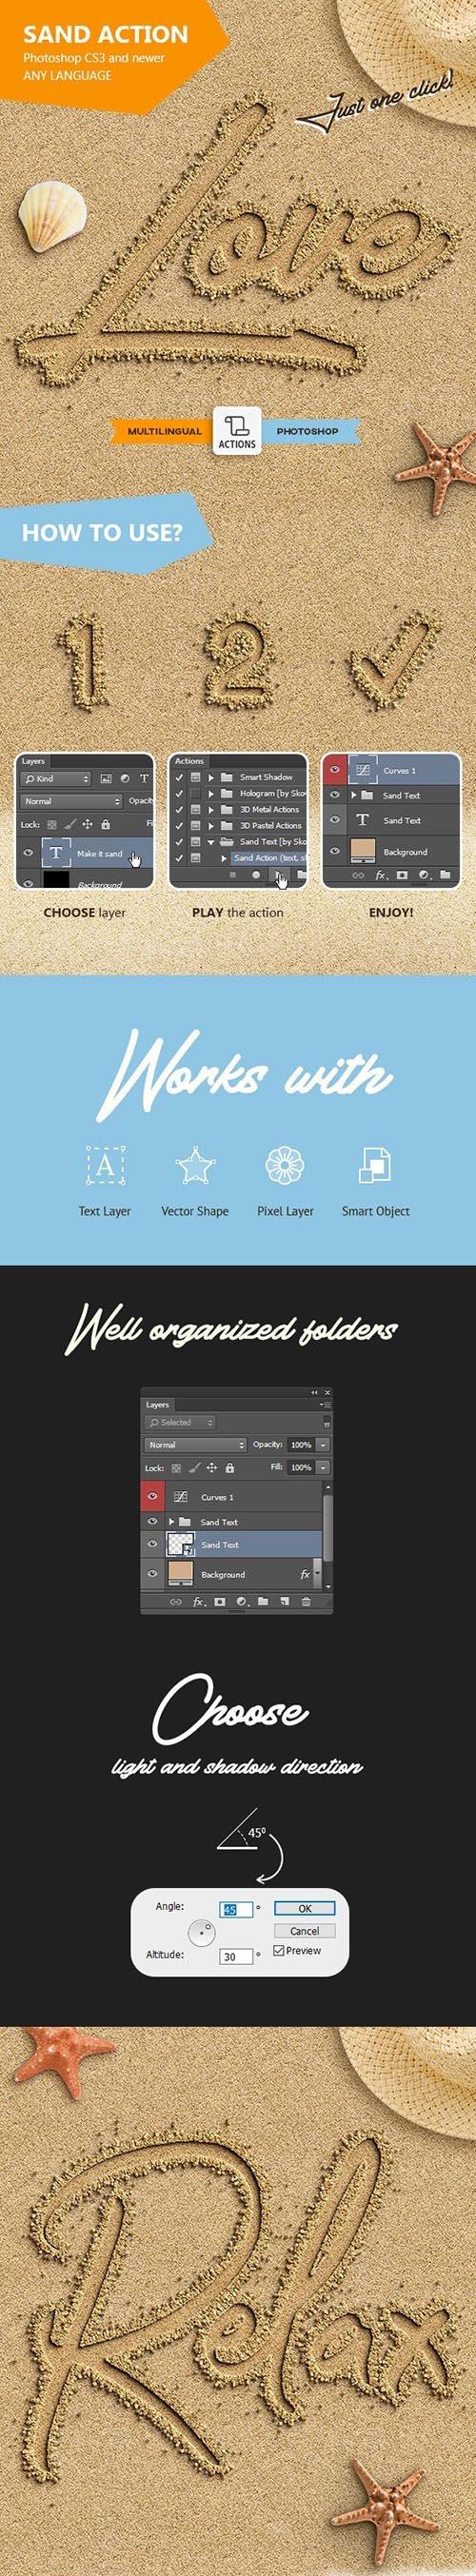 Sand Text - Photoshop Action 24068228